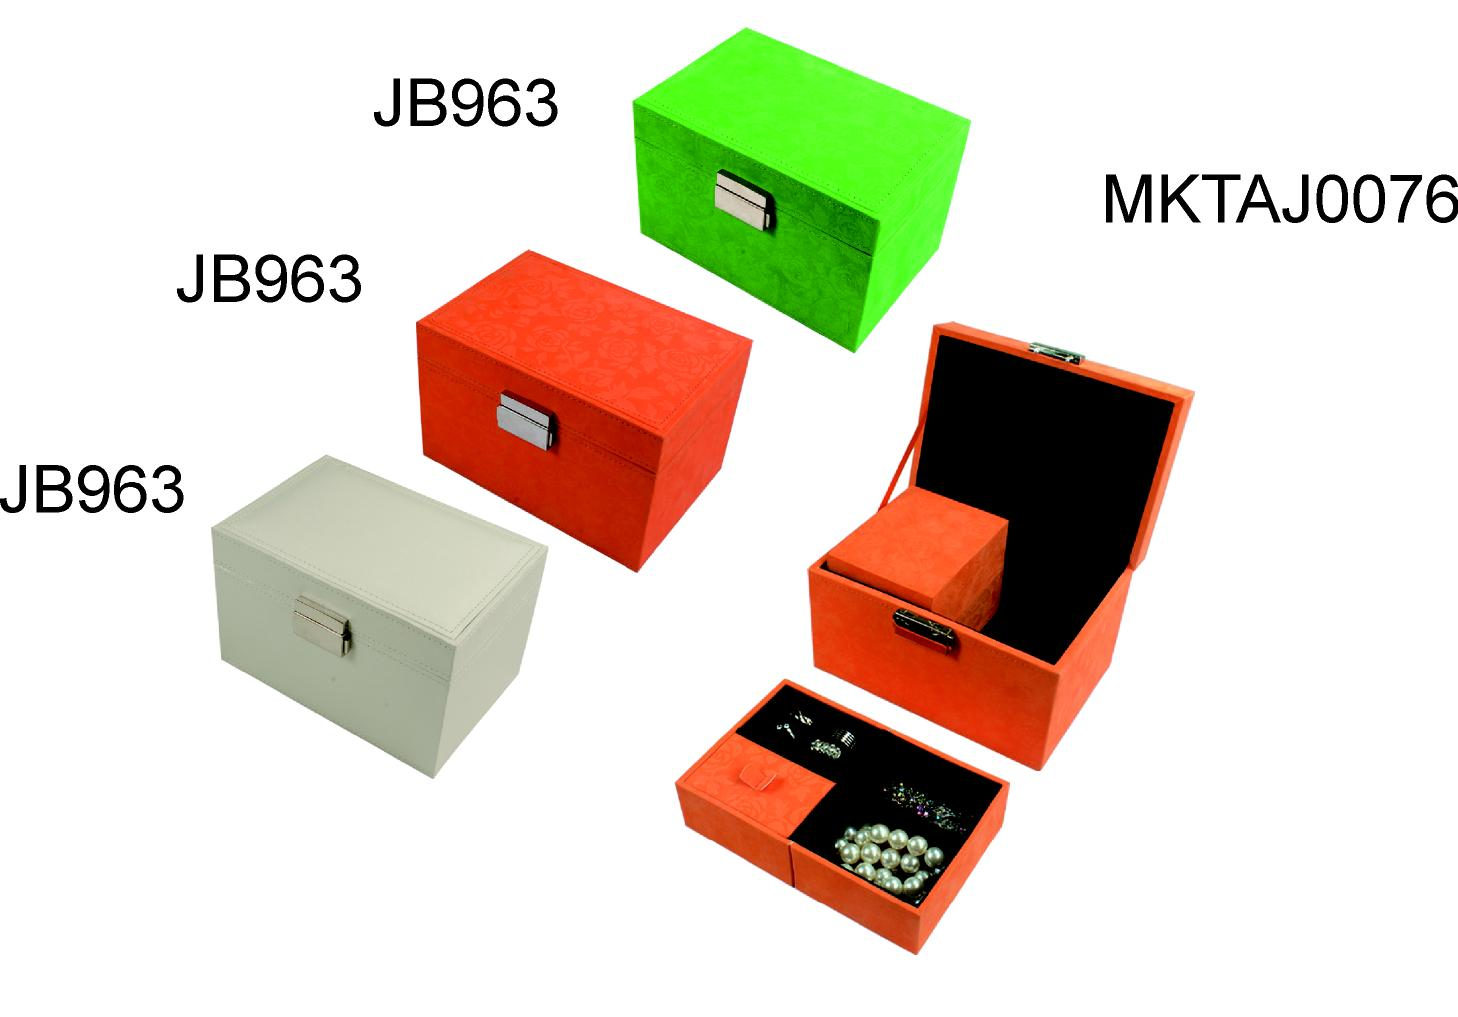 B胶盒款-胶盒款1